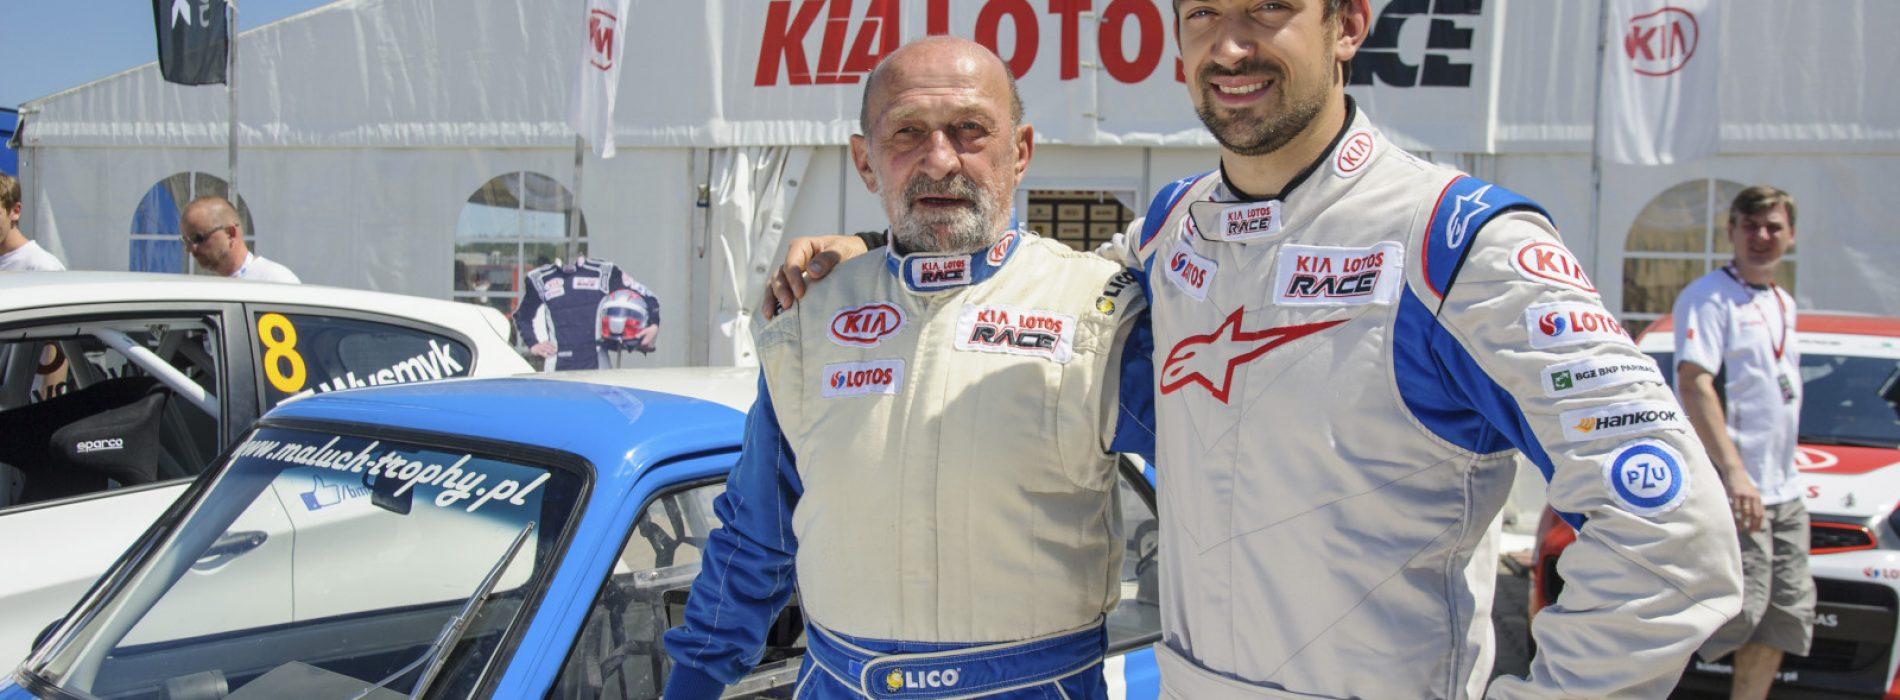 KIA LOTOS RACE 2016 – Karol Urbaniak niepokonany